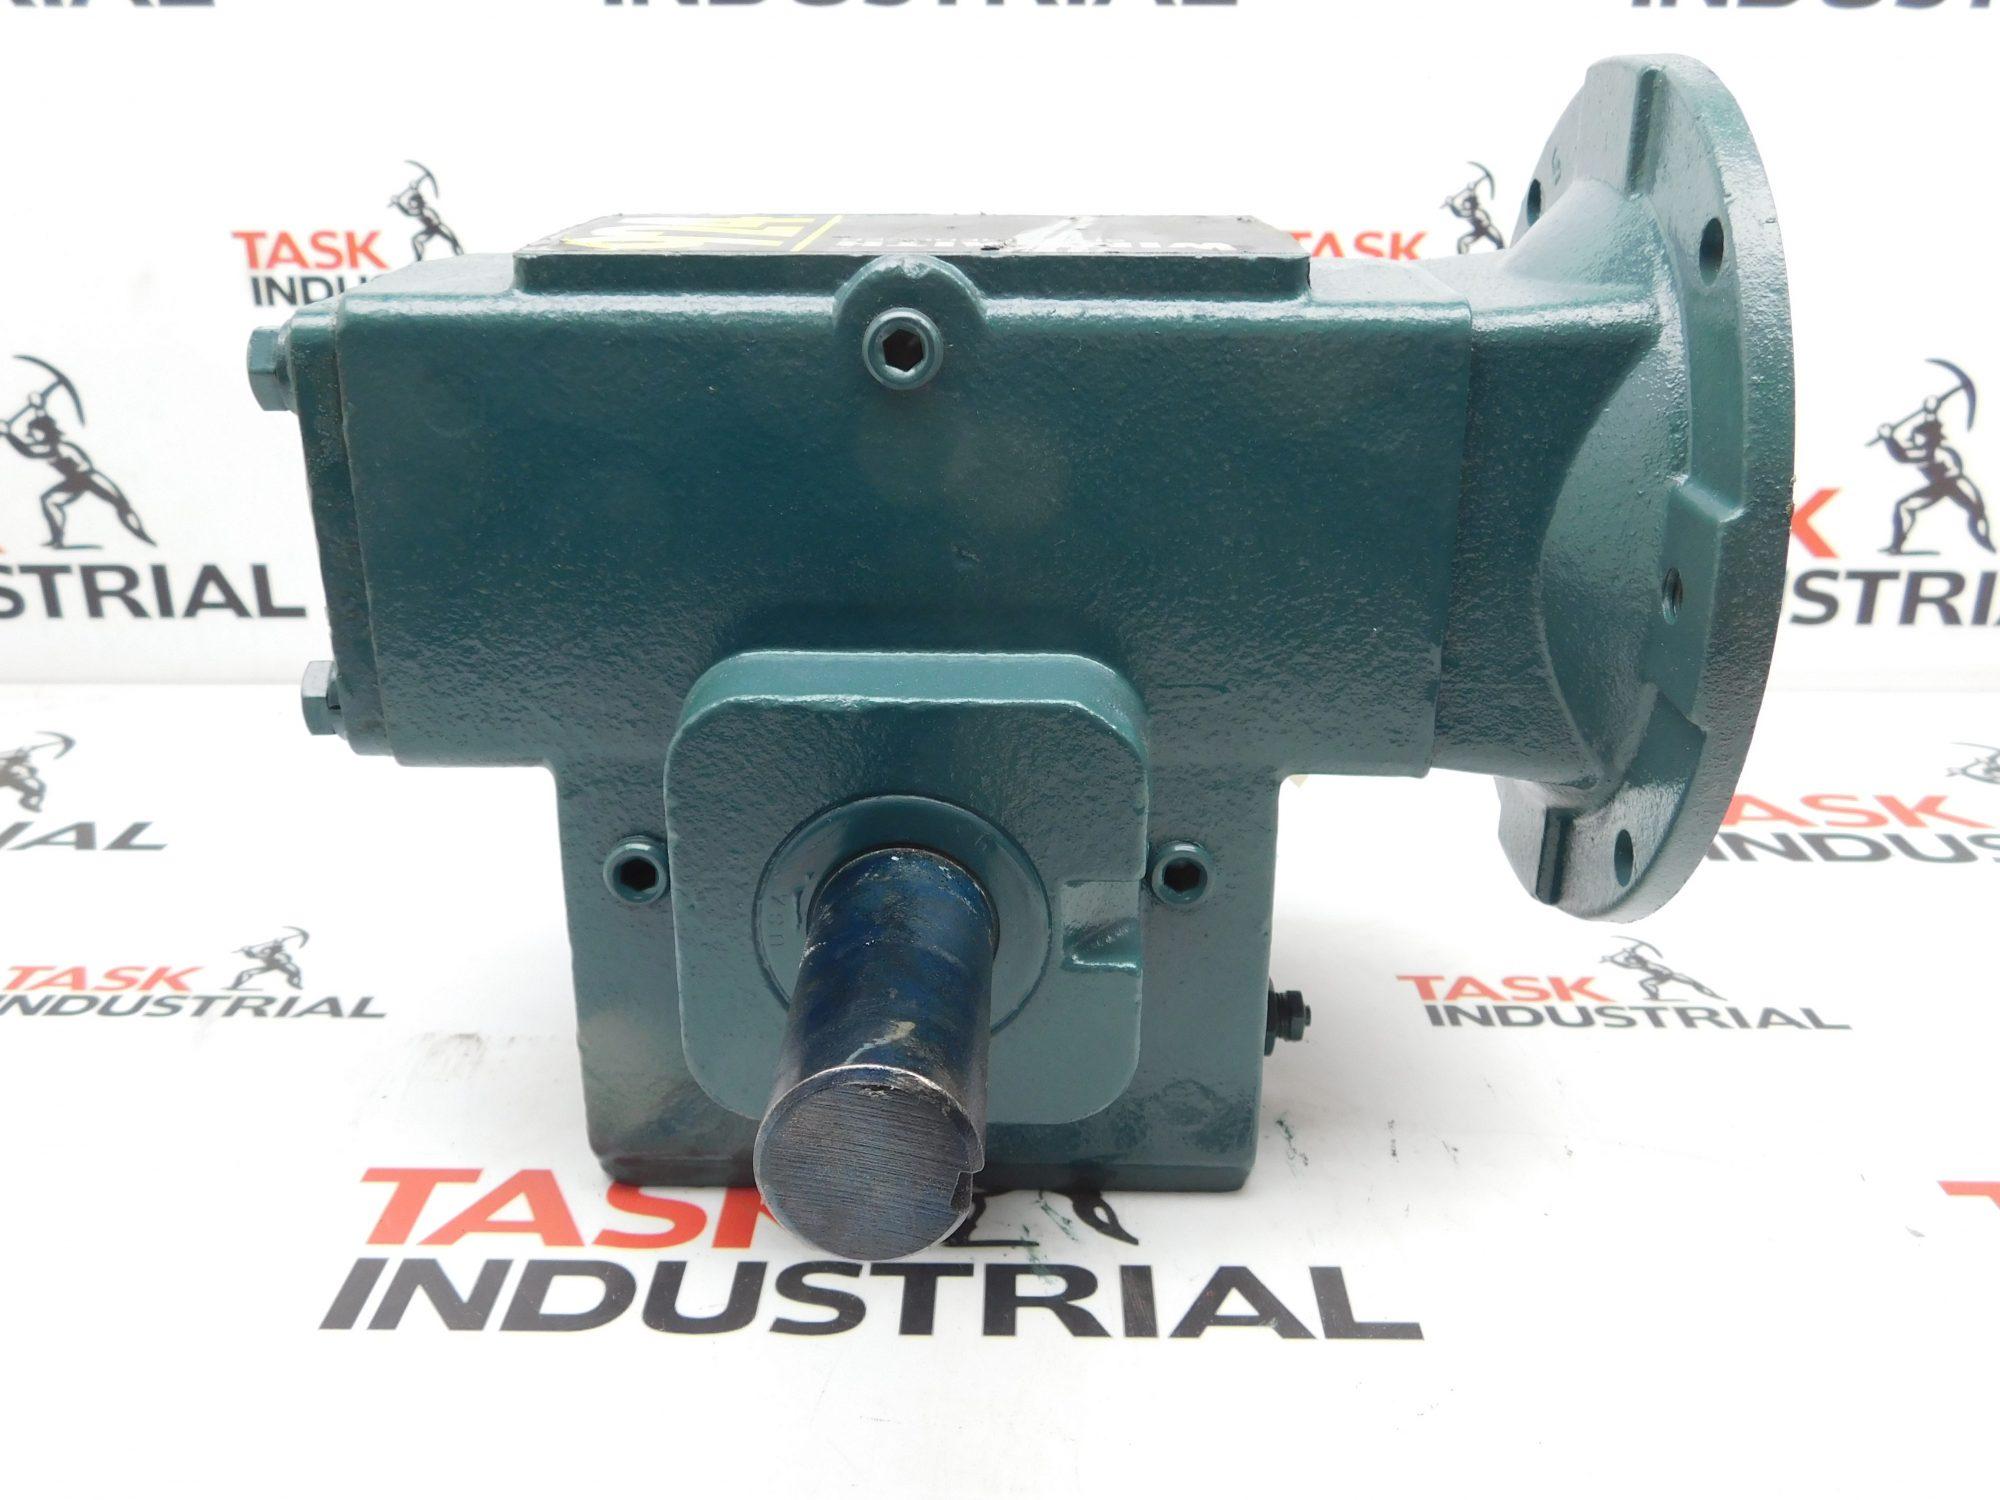 Winsmith 924MWT 1750RPM, Input HP 1.23 Ratio 30:1 Gear Reducer